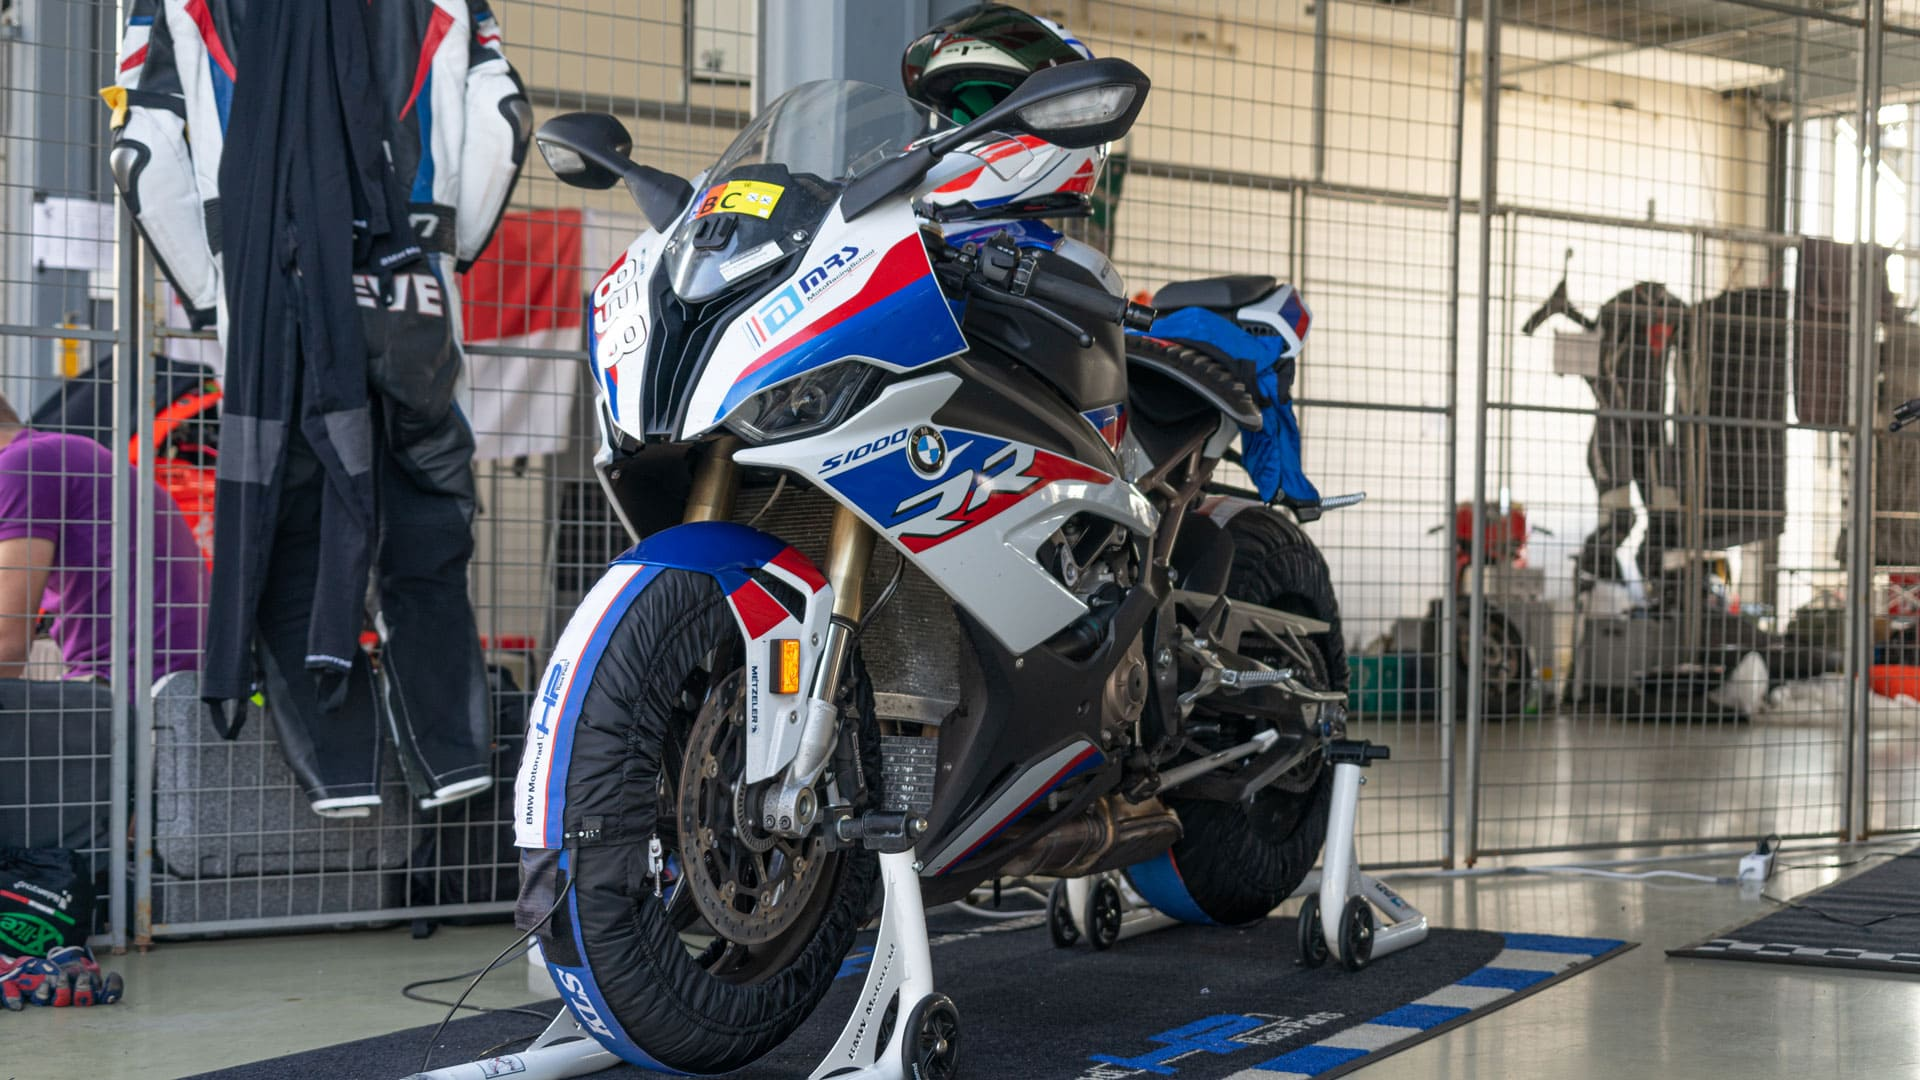 Moto RacingSchool Leihmotorrad